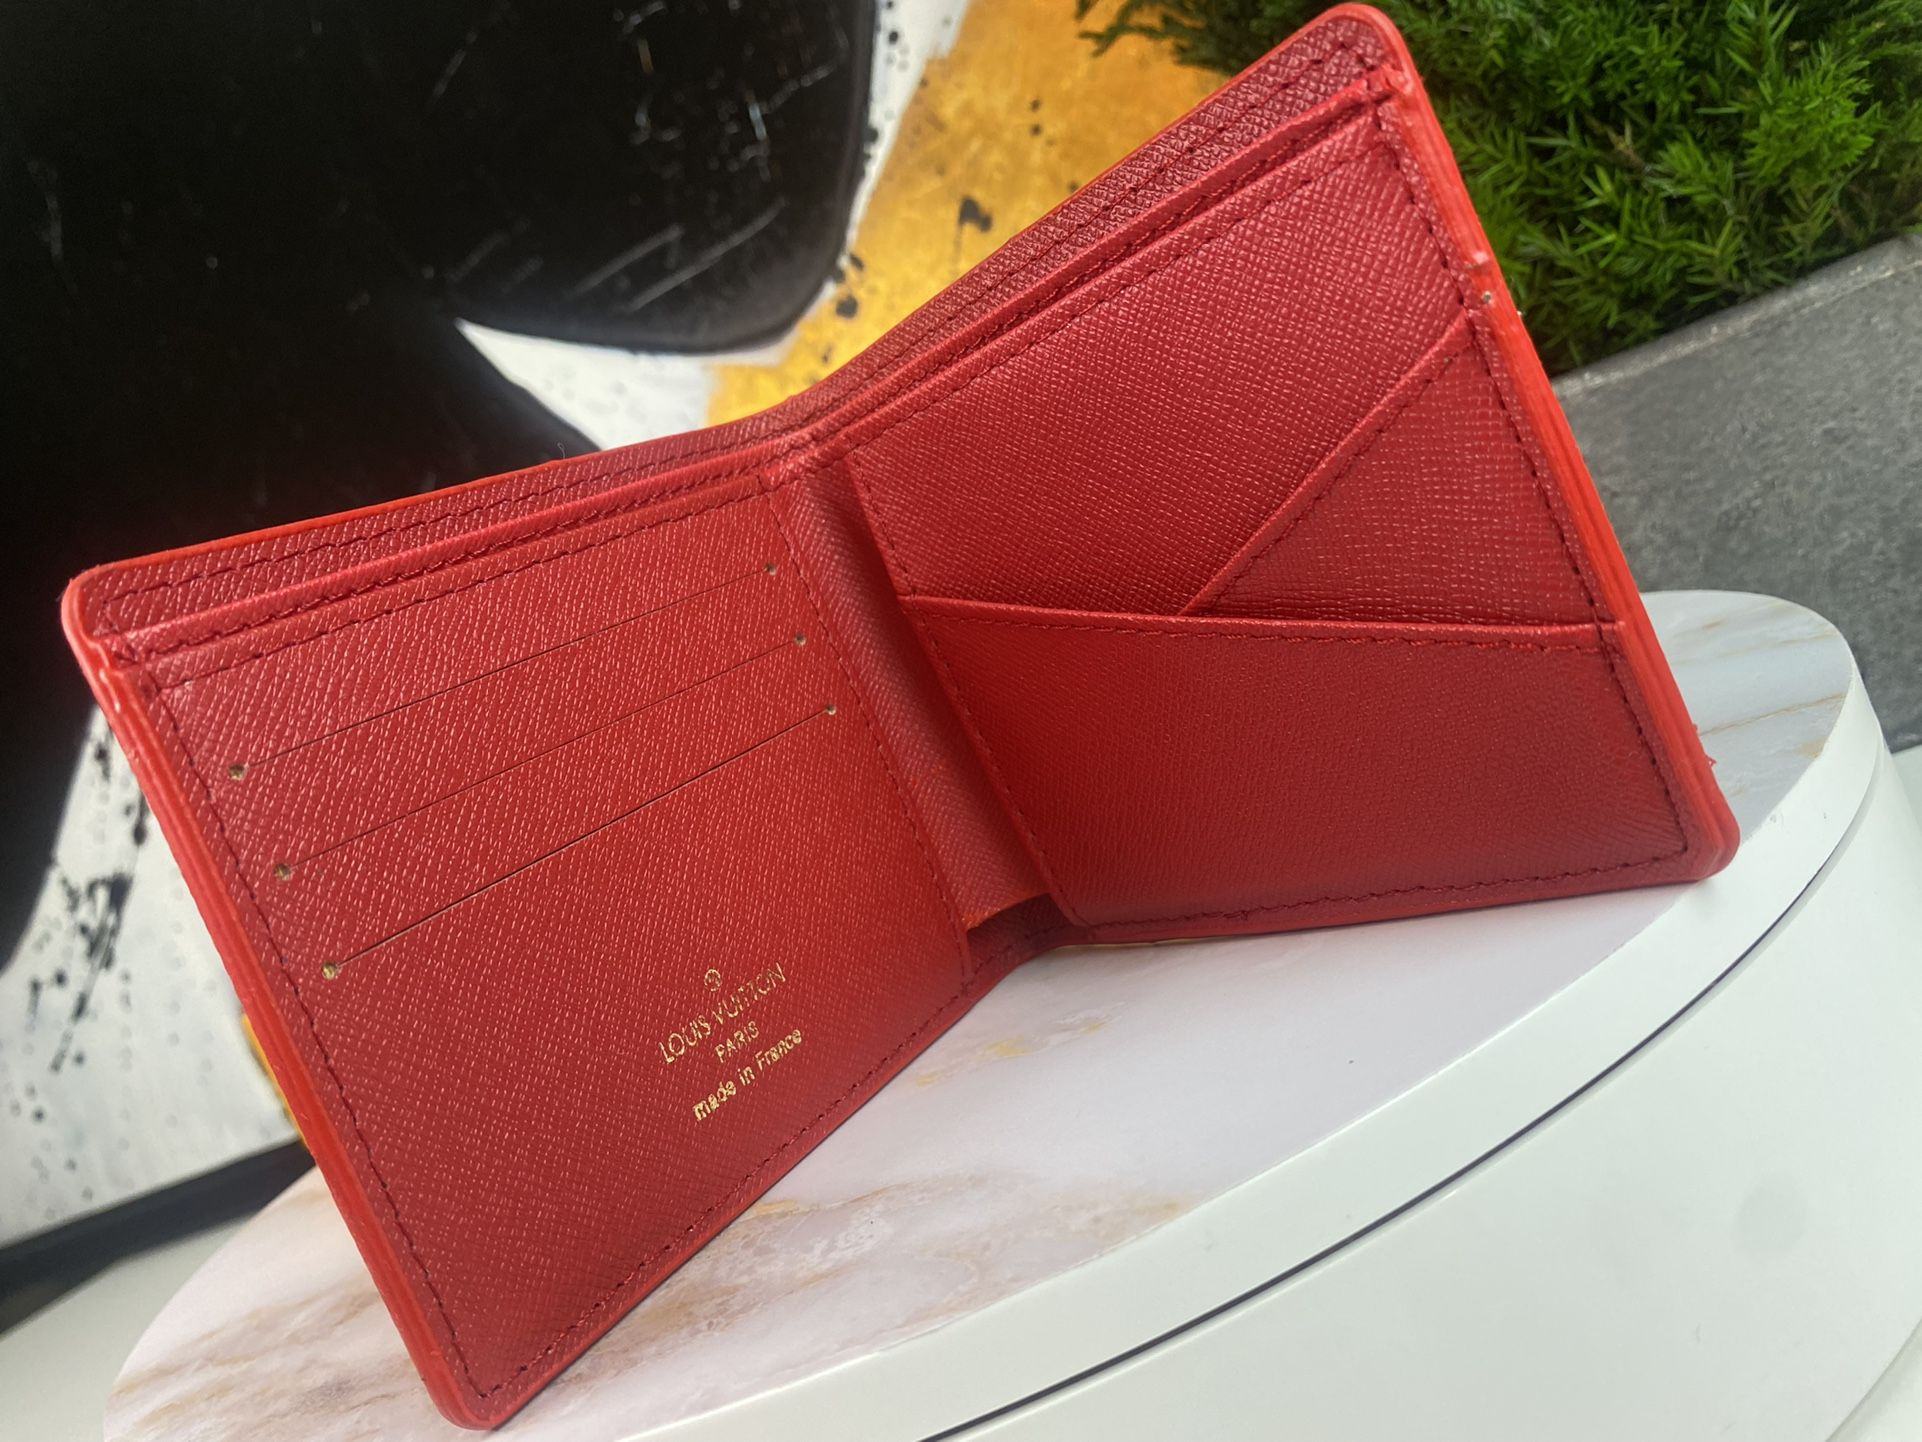 L.V x Supreme Wallet In Red